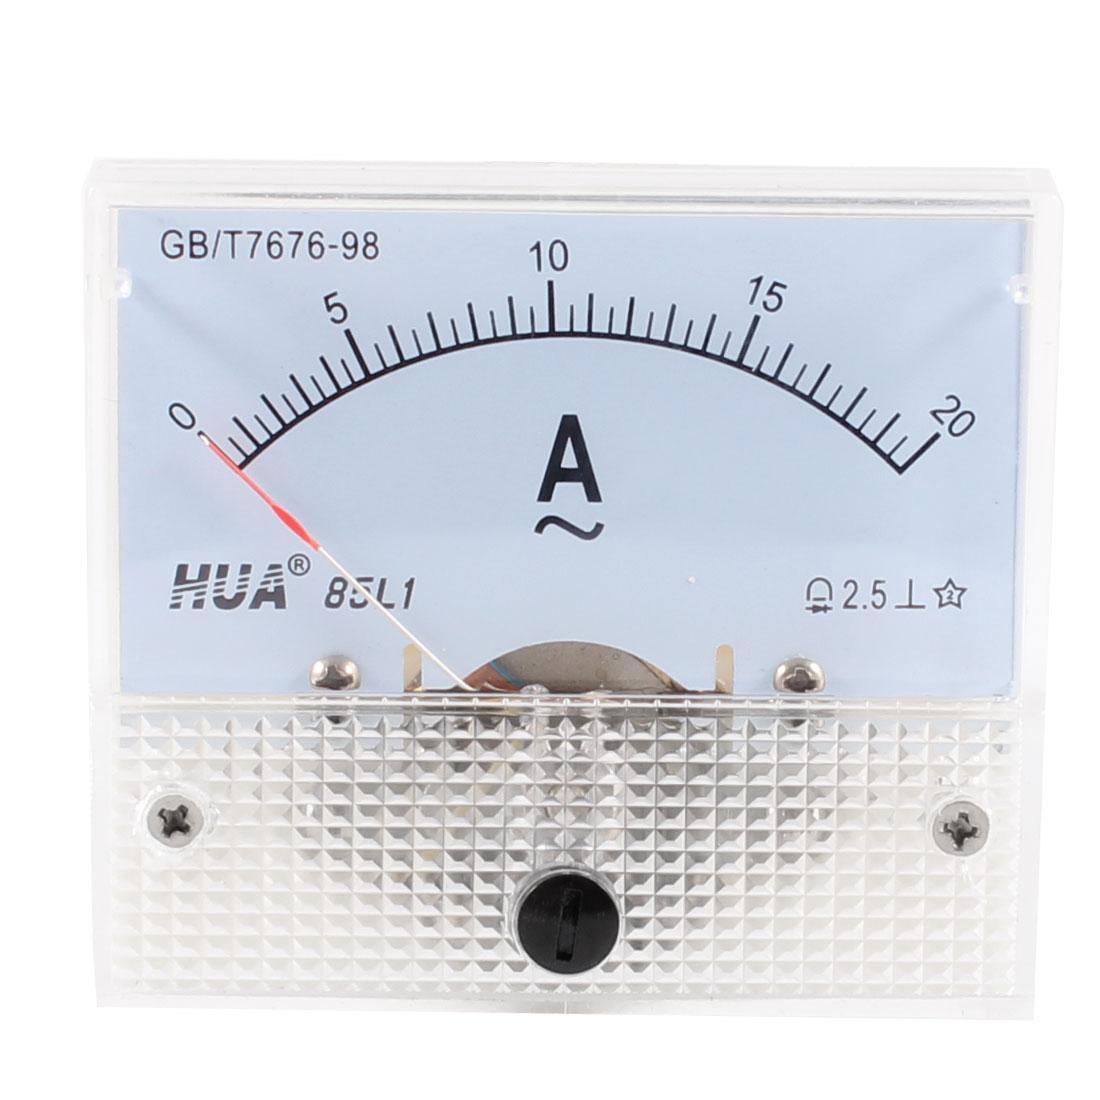 AC 0-20A Rectanglar Analog Panel Ammeter Gauge Class 2.5 85L1